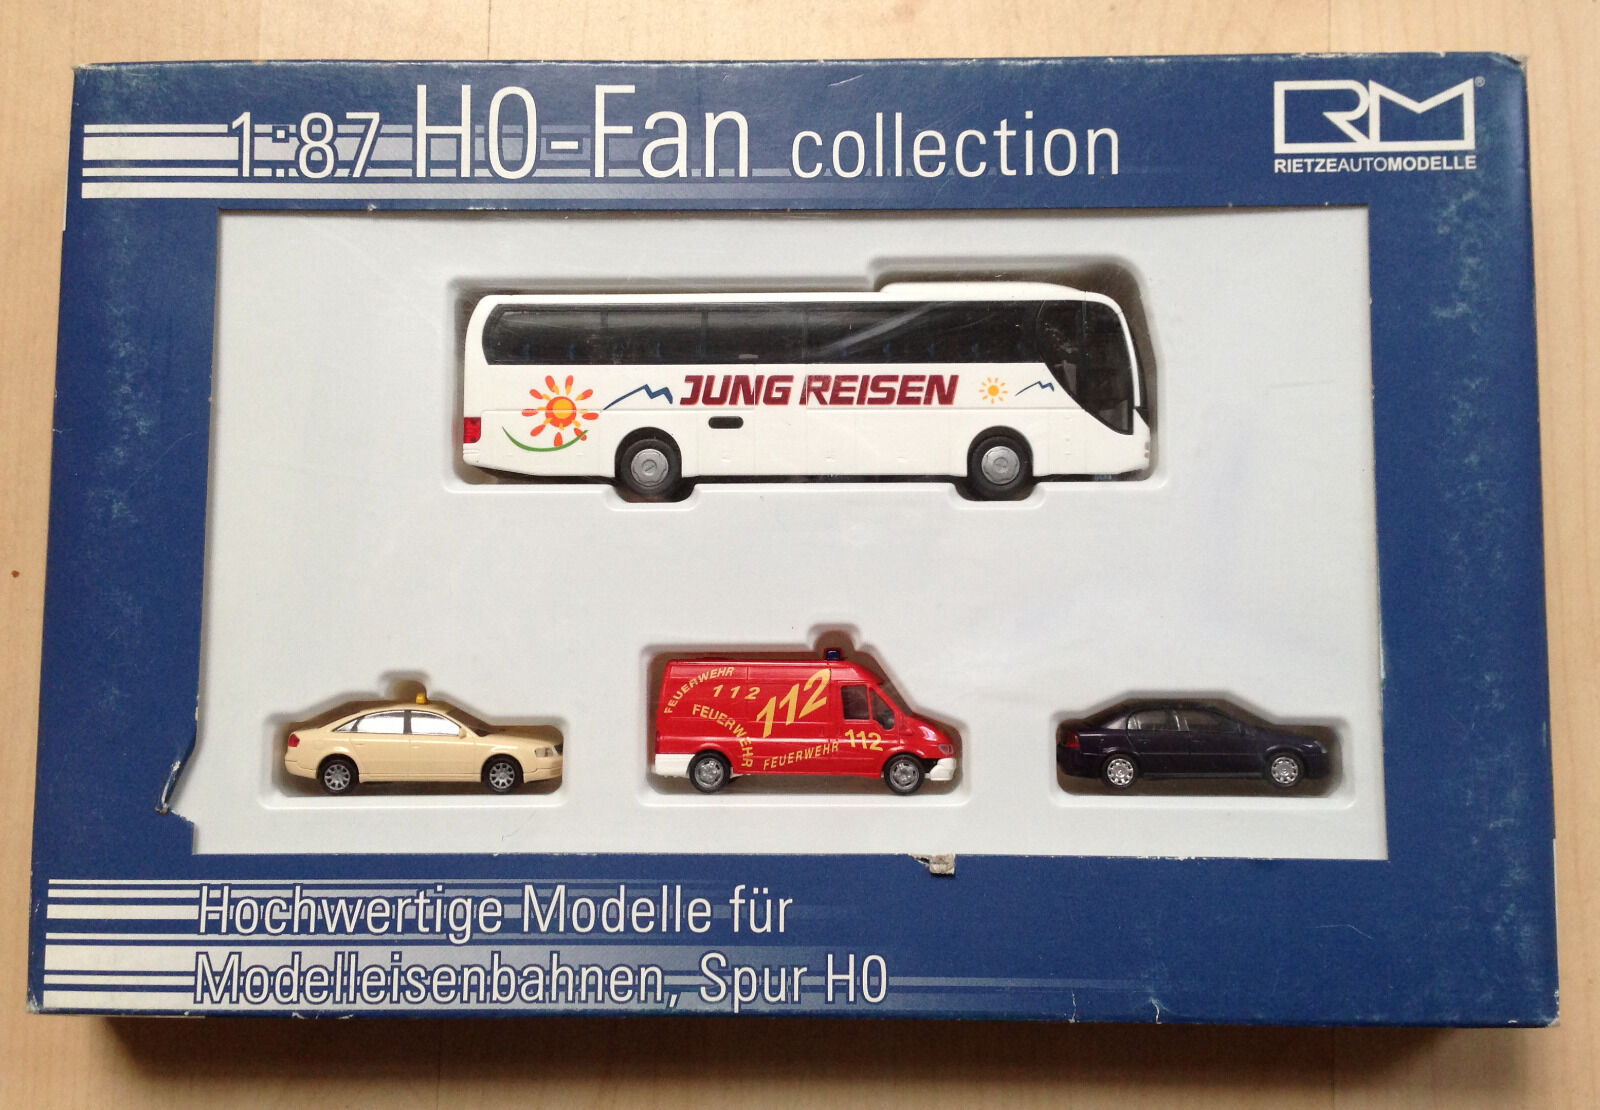 Modelleisenbahn Rietze Fan Edition Feuerwehr Taxi Reisebus Auto H0 HO